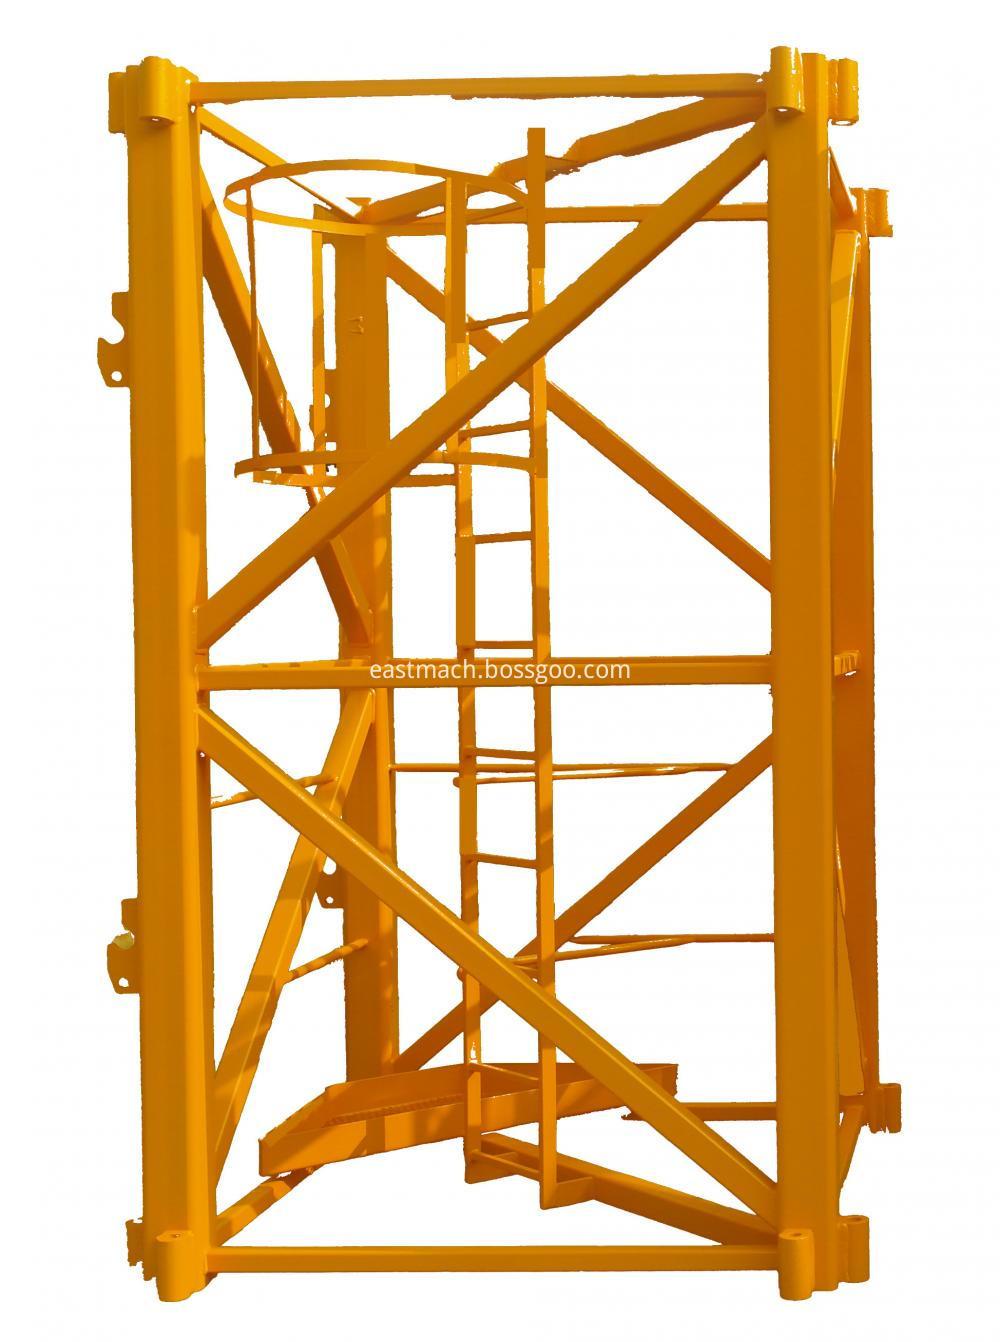 Liebherr Mast Sections